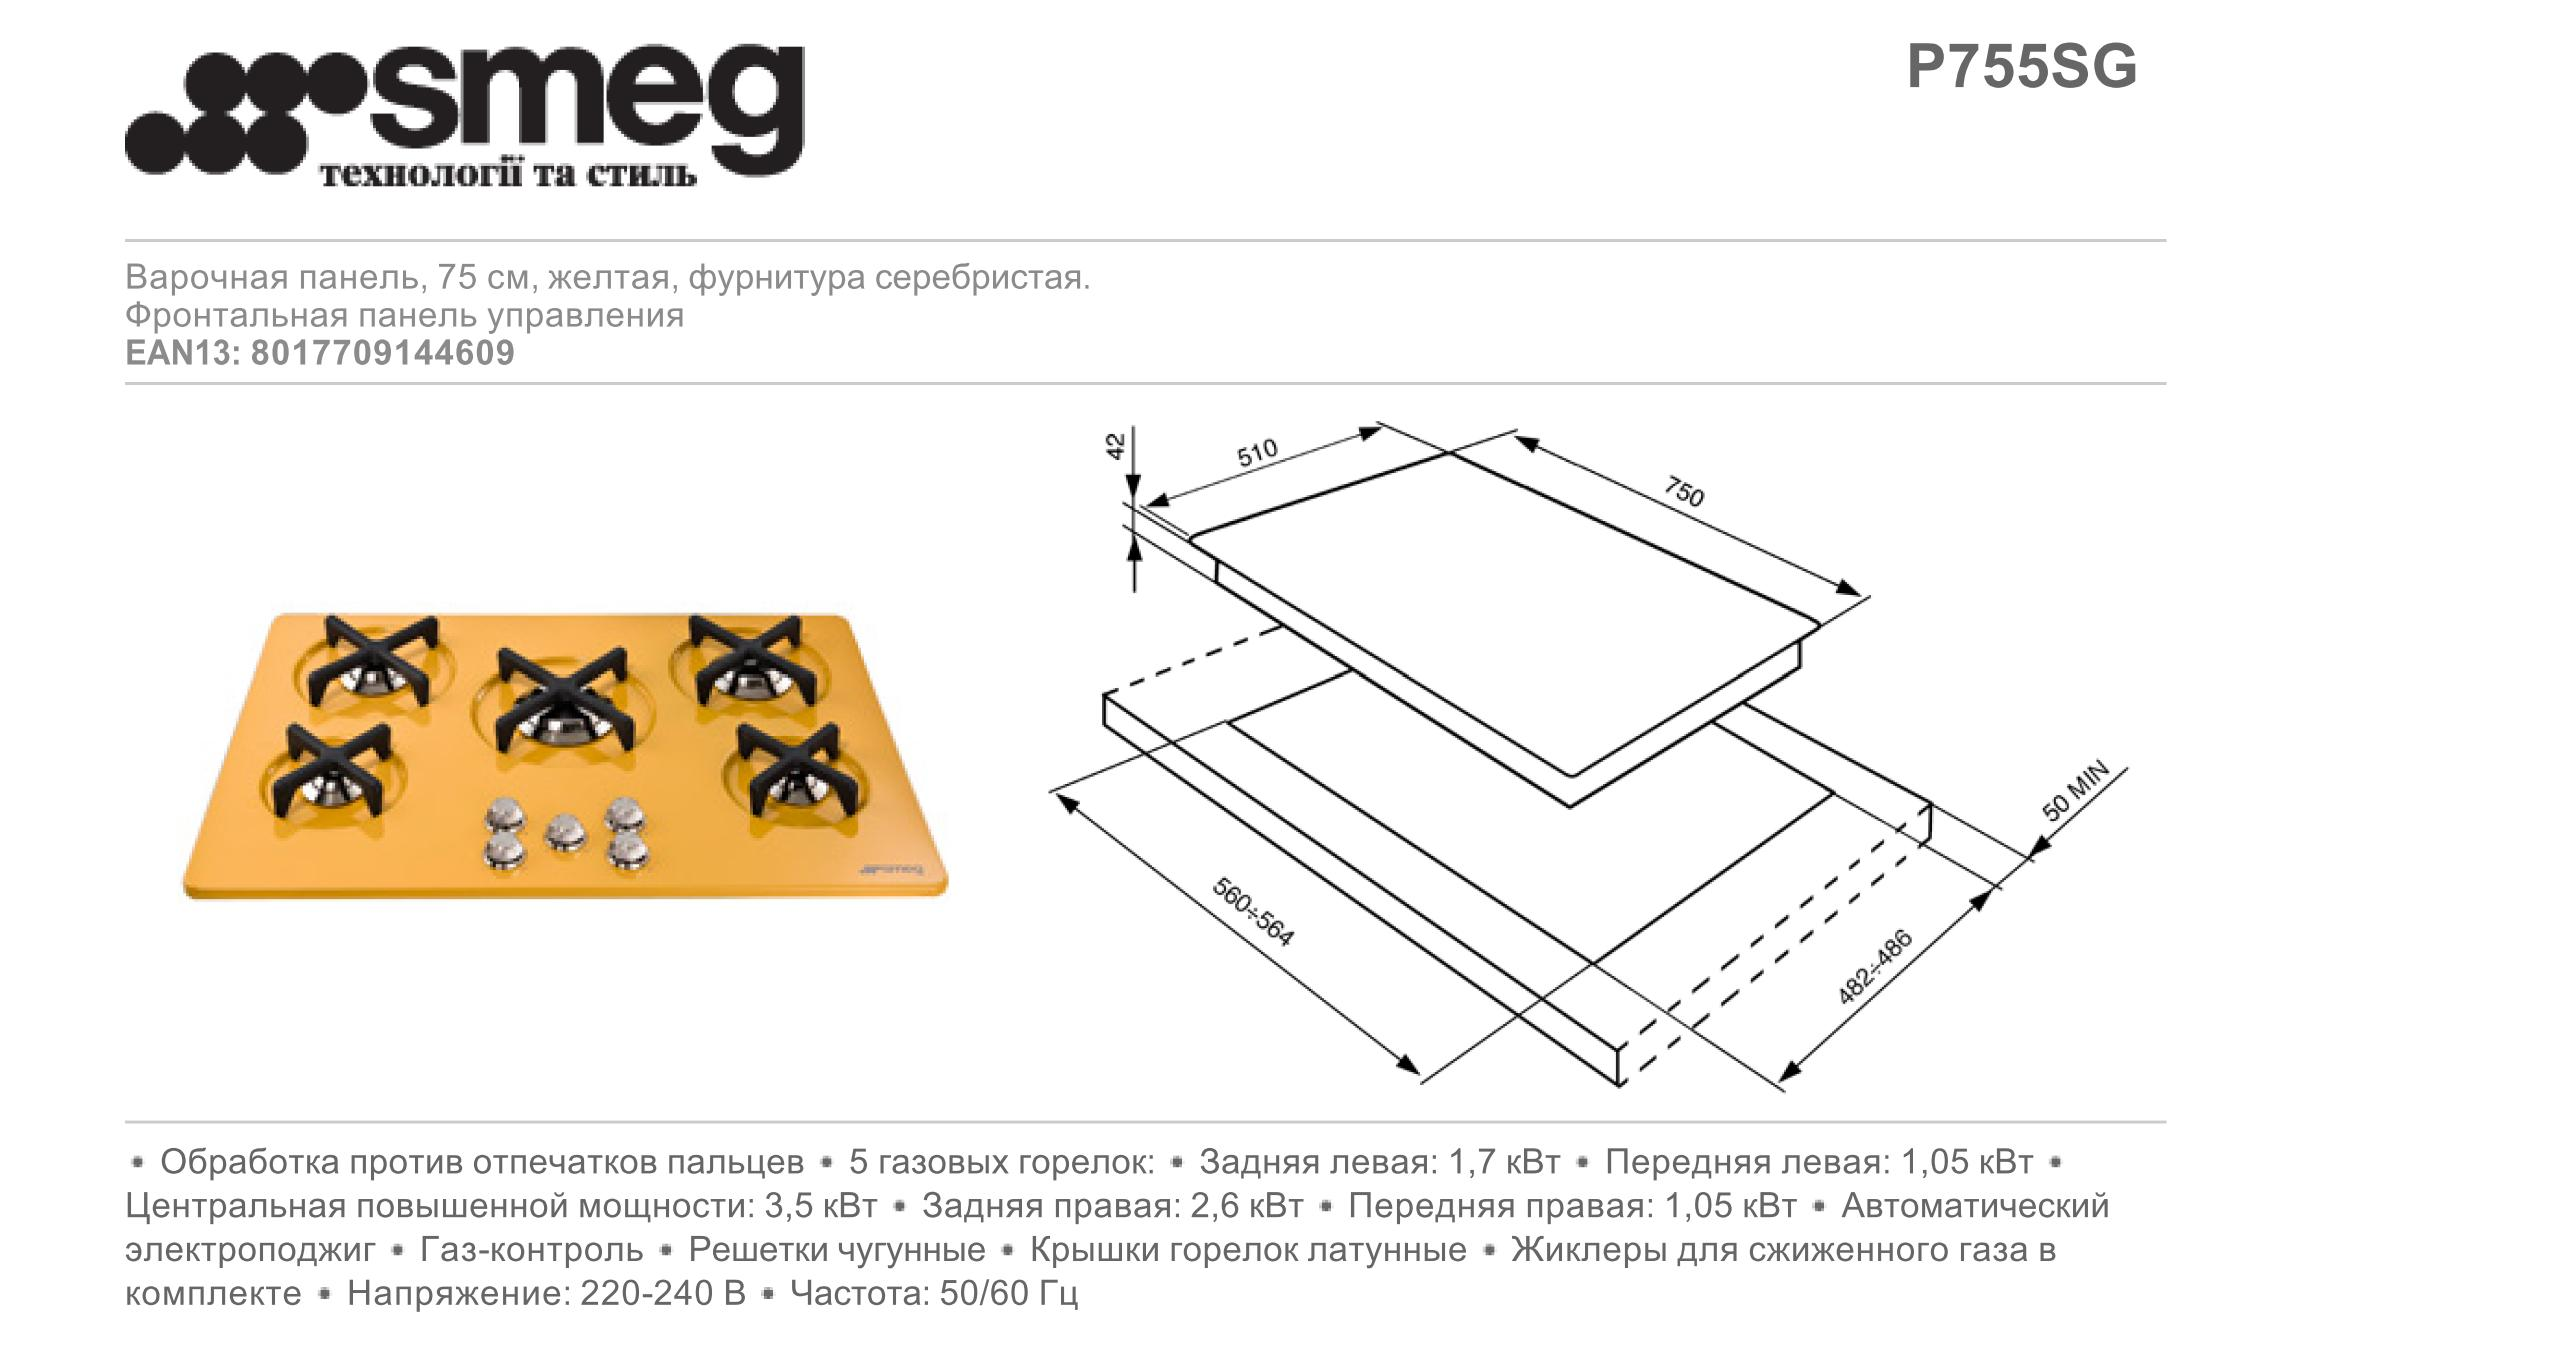 http://www.btmarket.com.ua/img_upl2/P755SG_mini.jpg